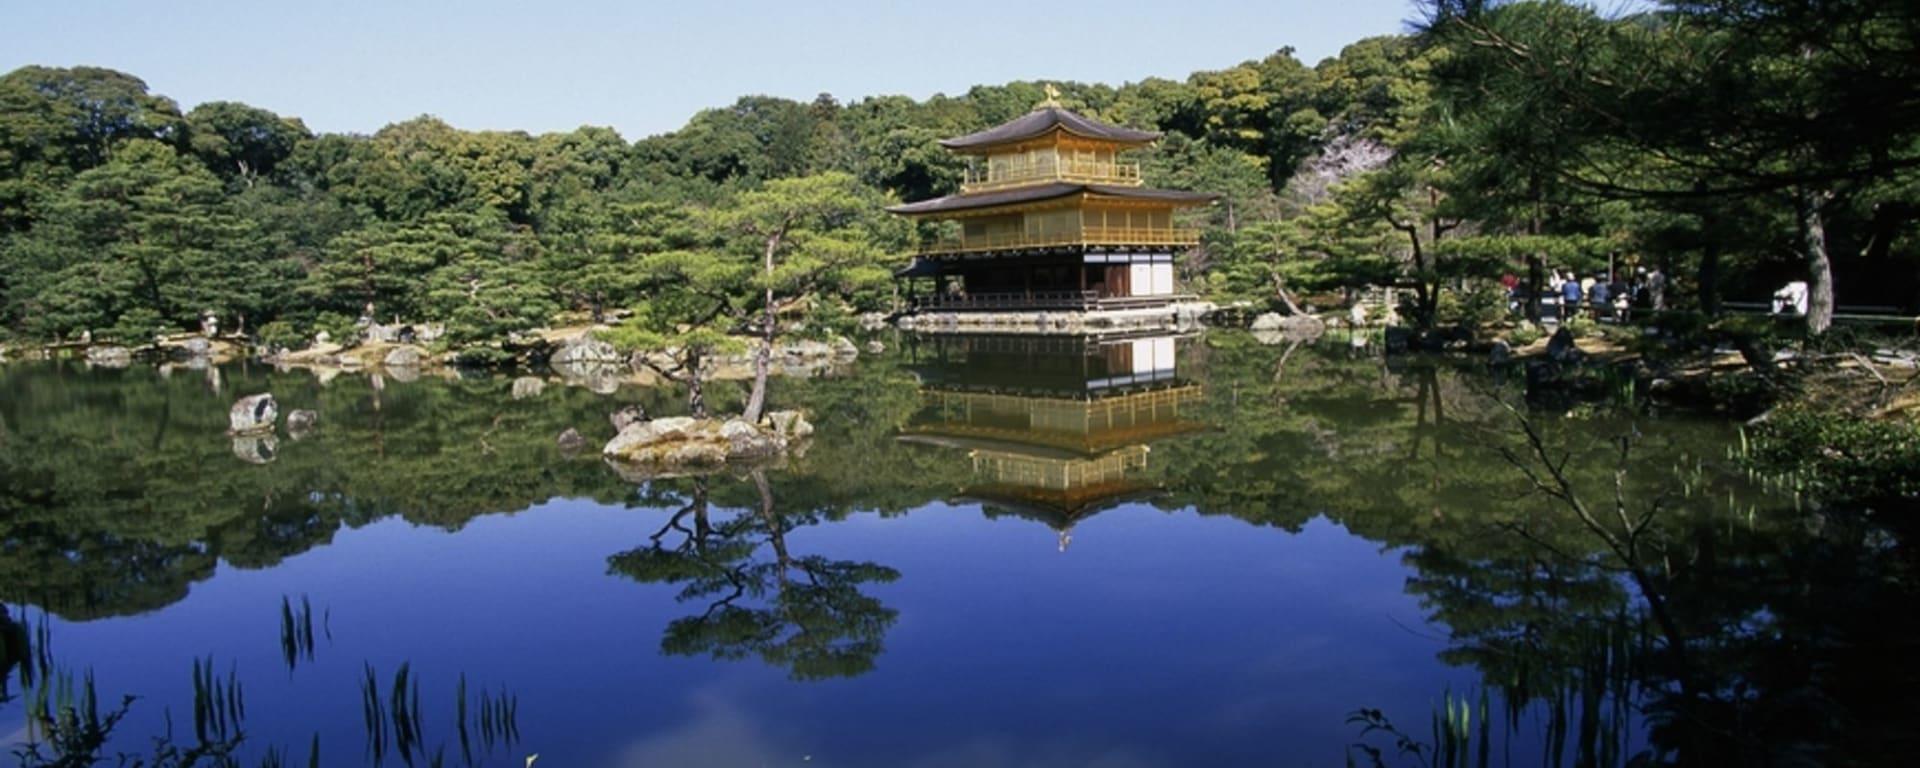 Stadtrundfahrt Kyoto - Morgentour: Kyoto Golden Pavilion Kinkakuji